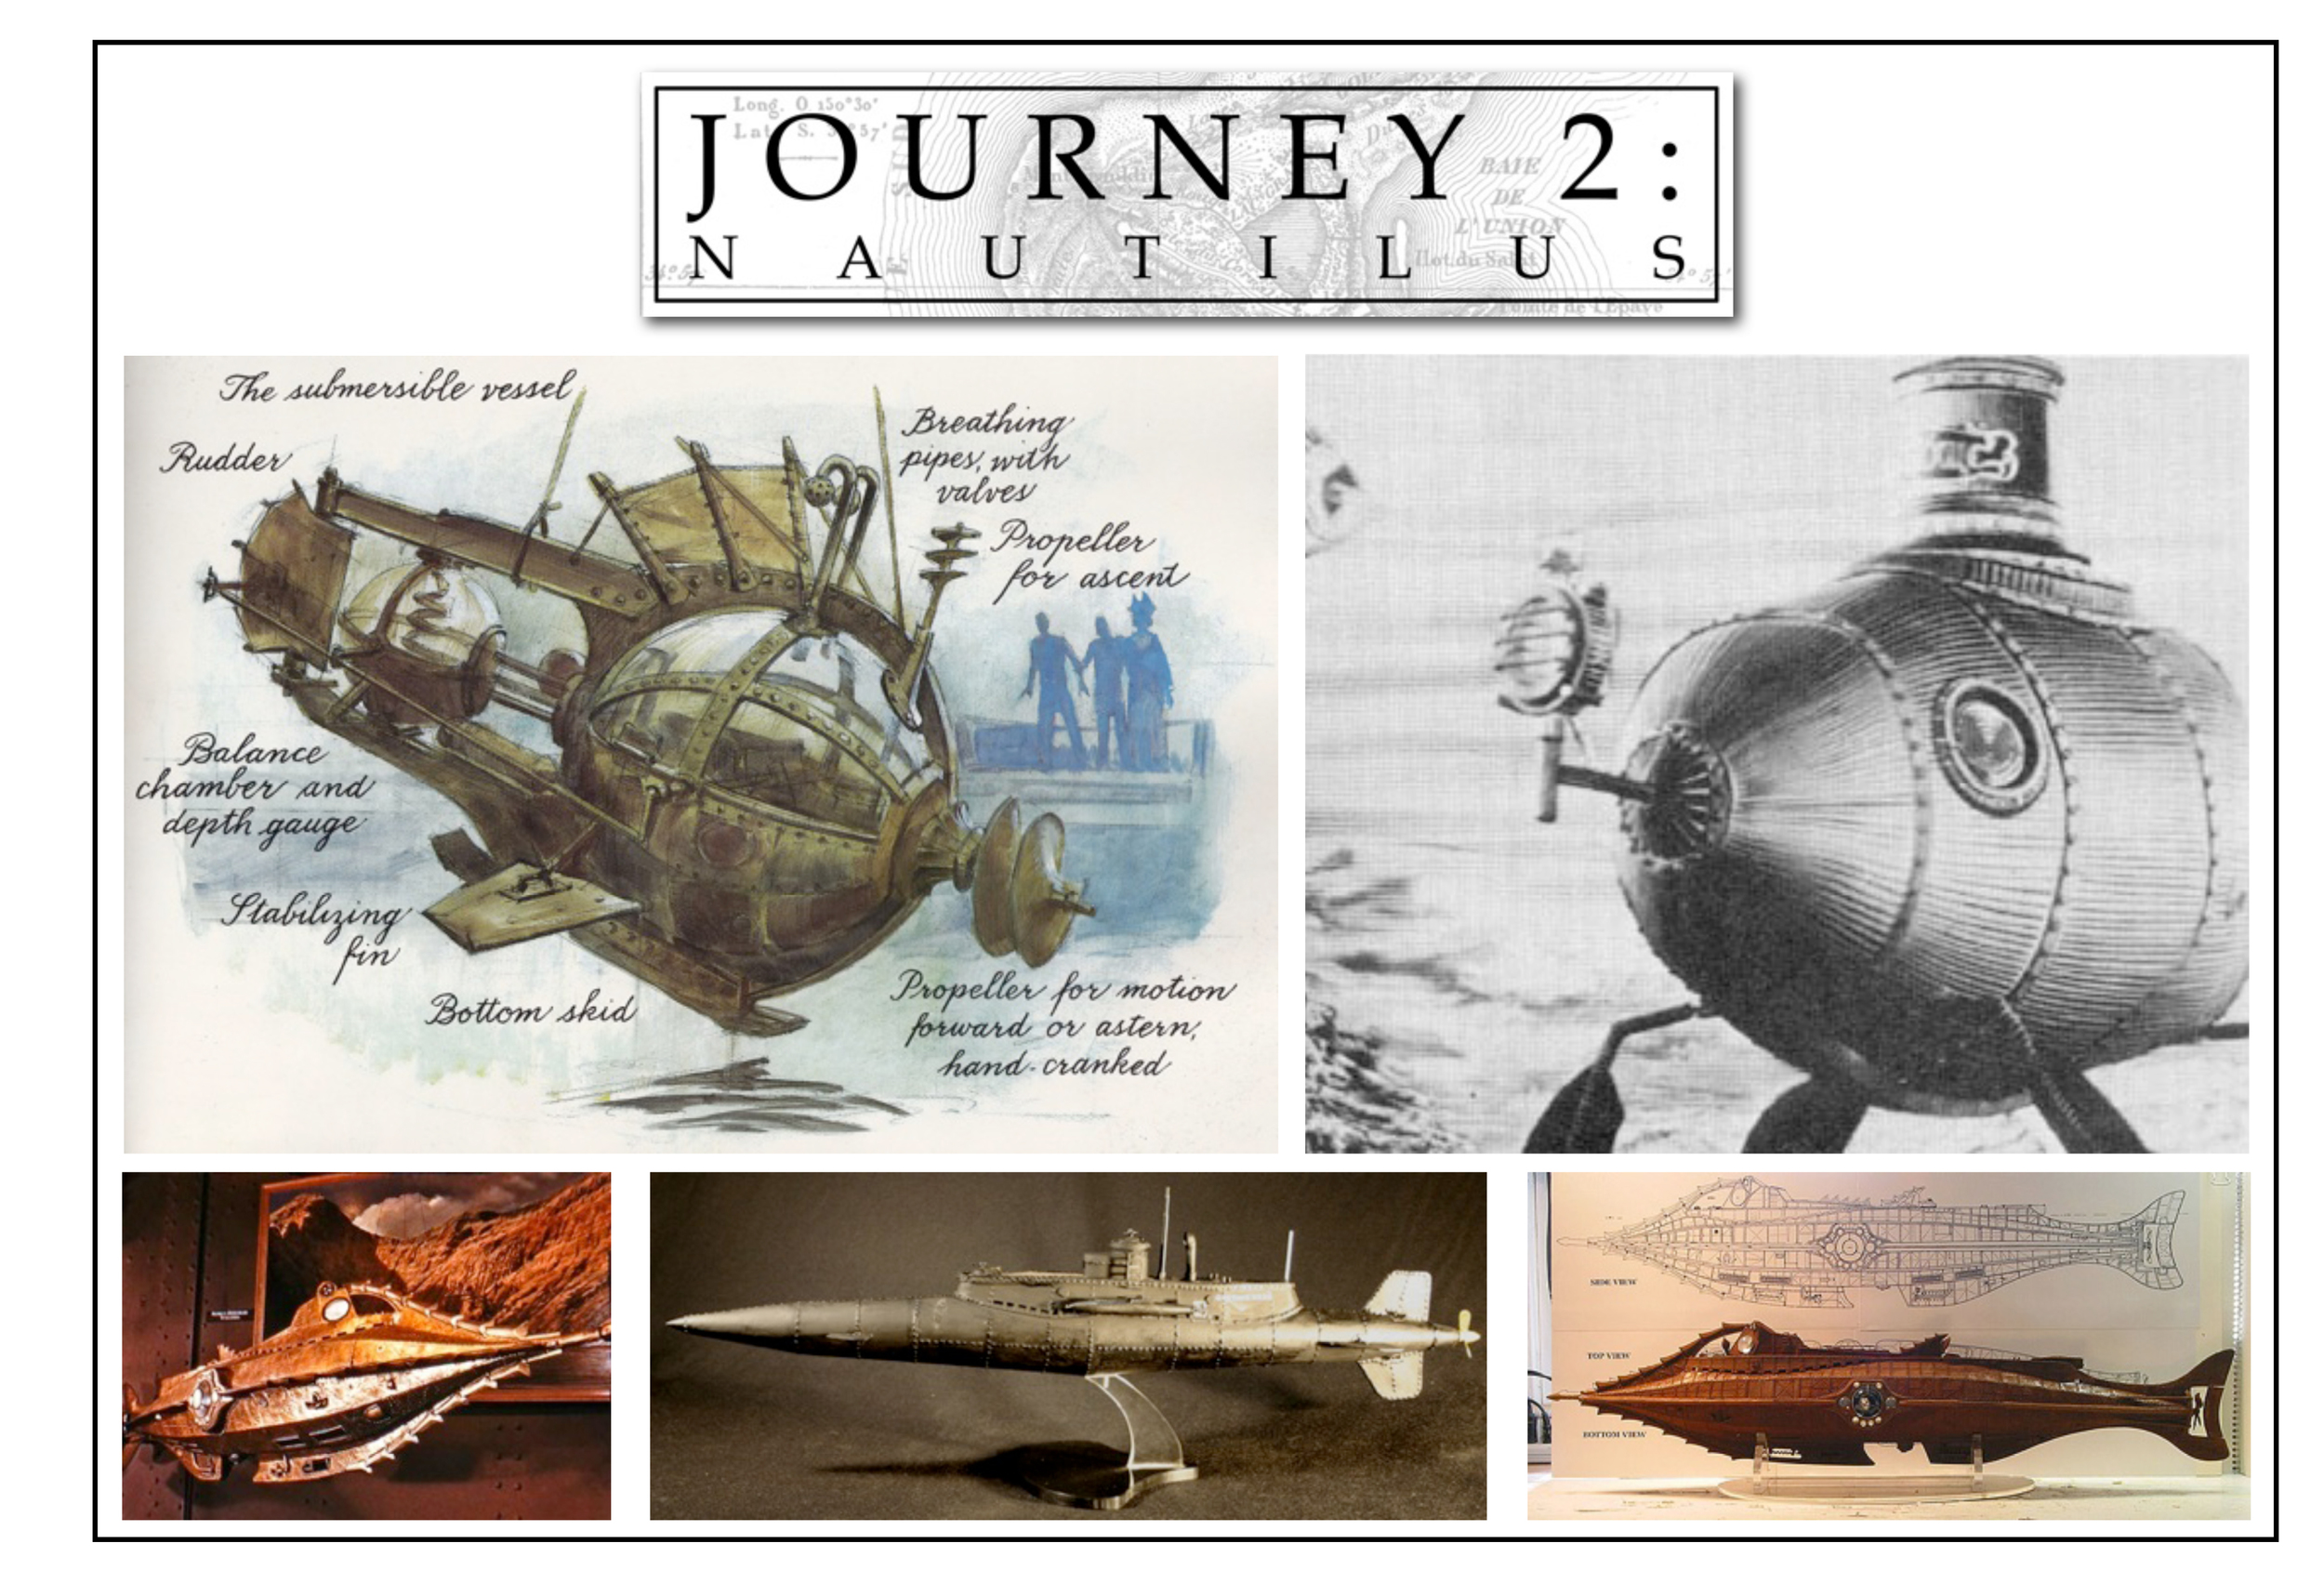 JourneyBoards041610-80.jpg